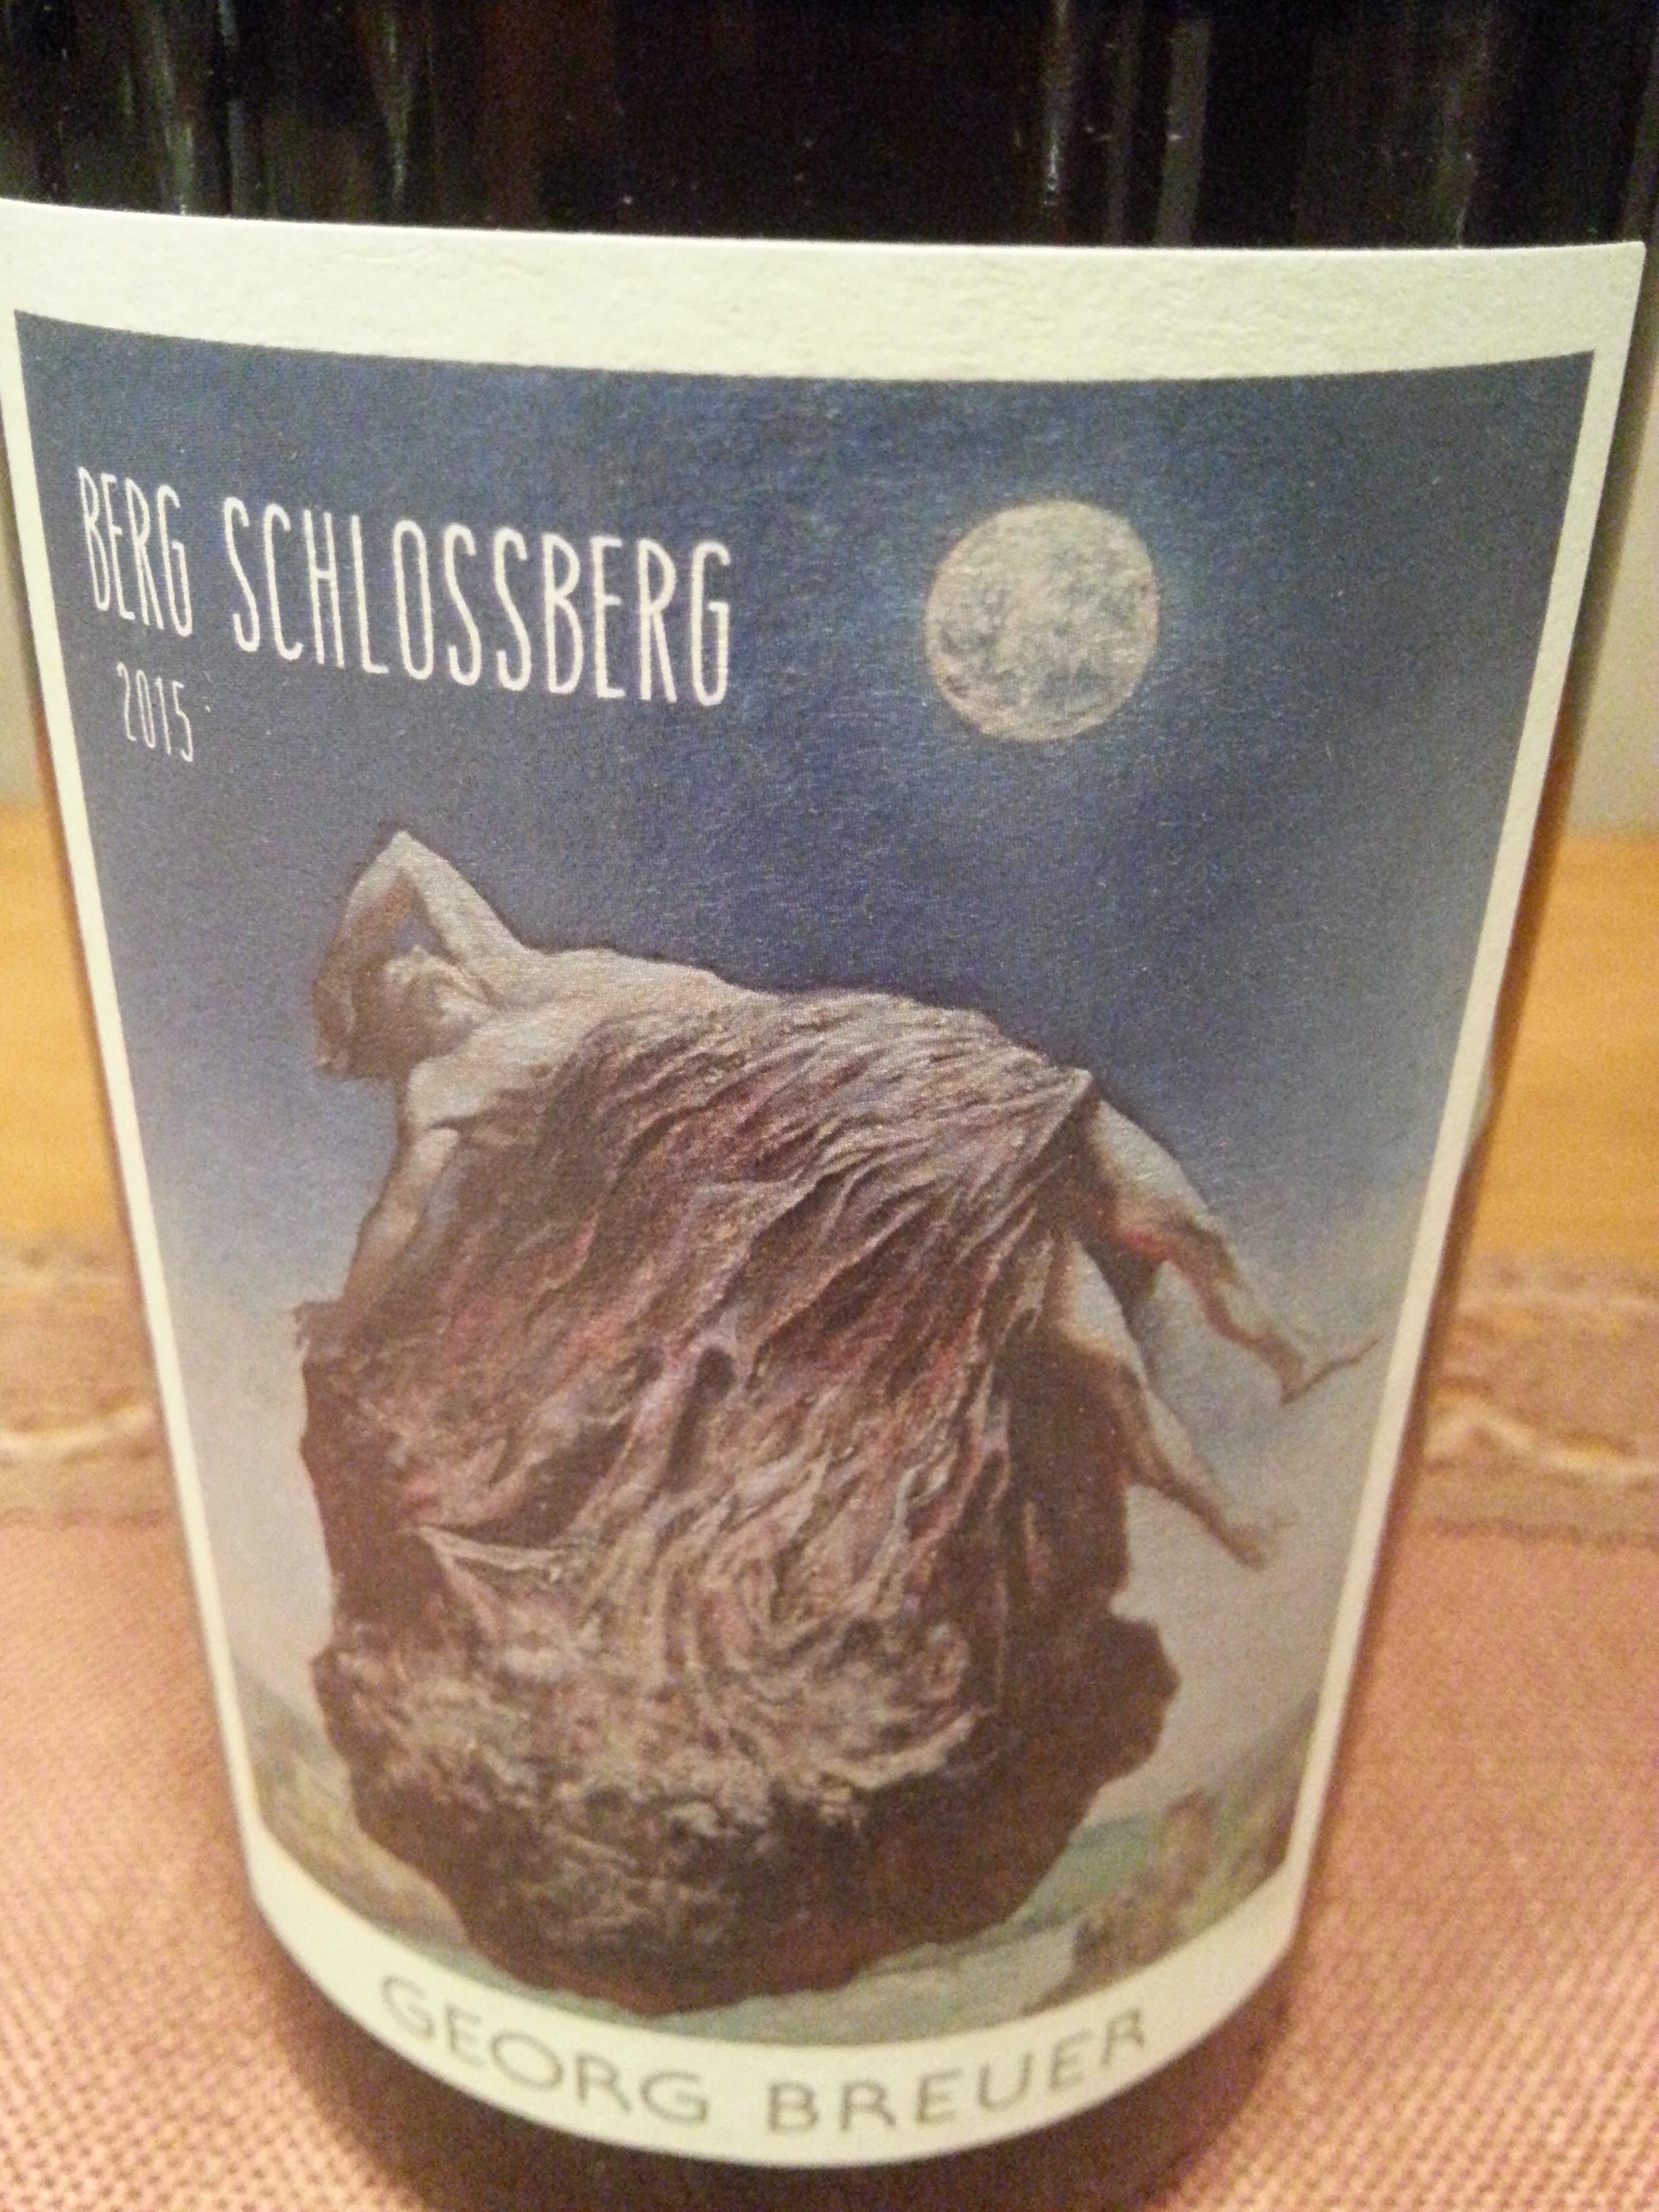 2015 Riesling Berg Schlossberg | Breuer